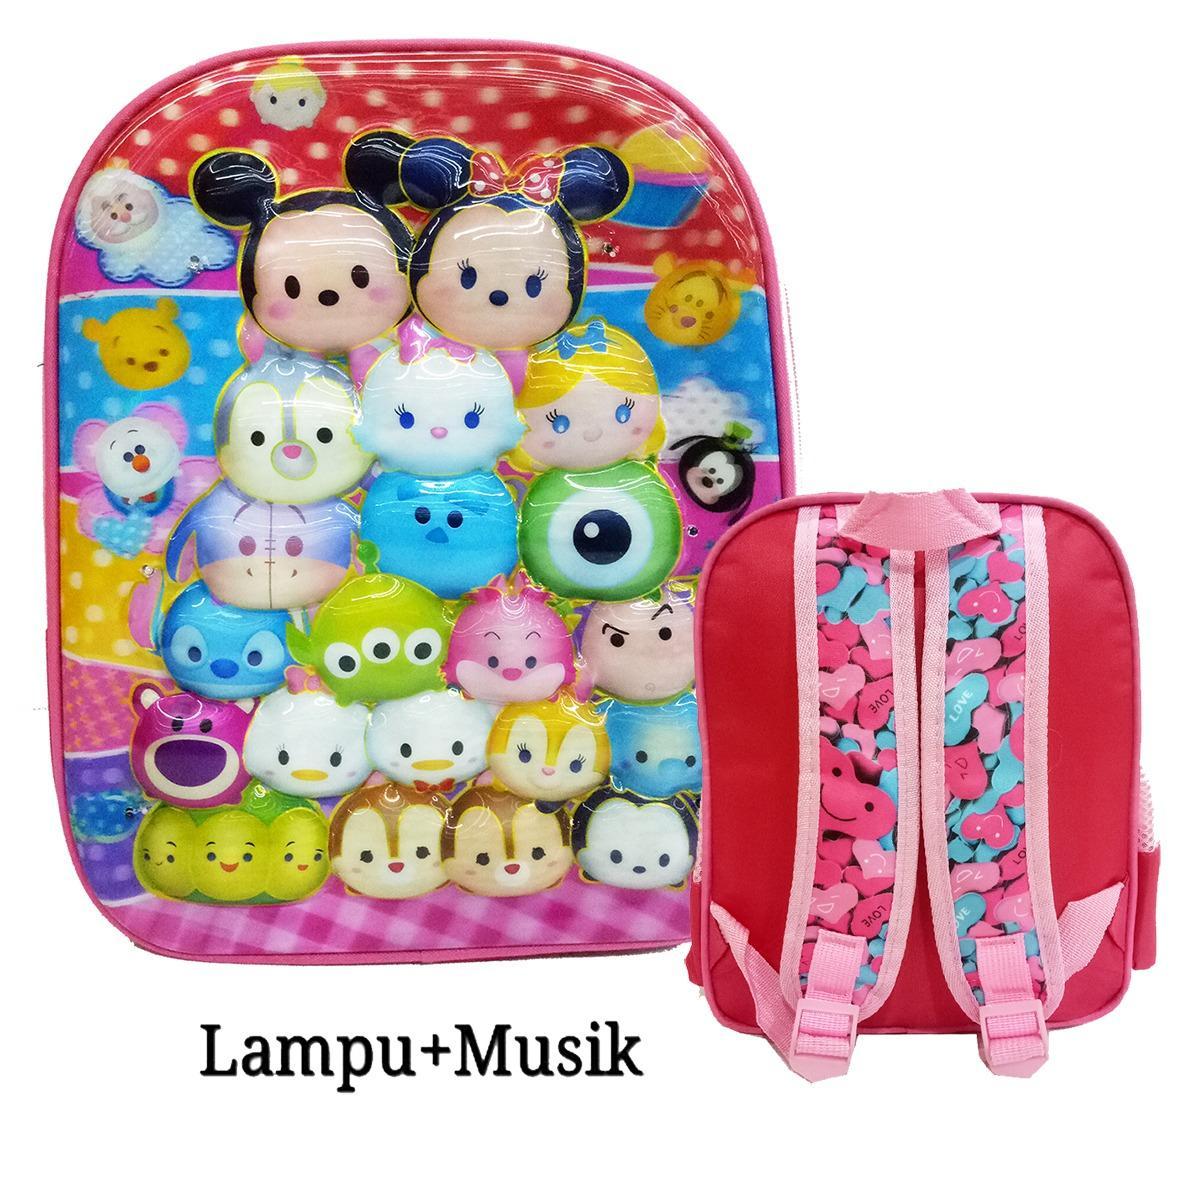 Promo Onlan Tas Anak Sekolah Tk Model Lampu Music 2 Kantung Karakter Anak Perempuan 5D Import Pink Di Dki Jakarta